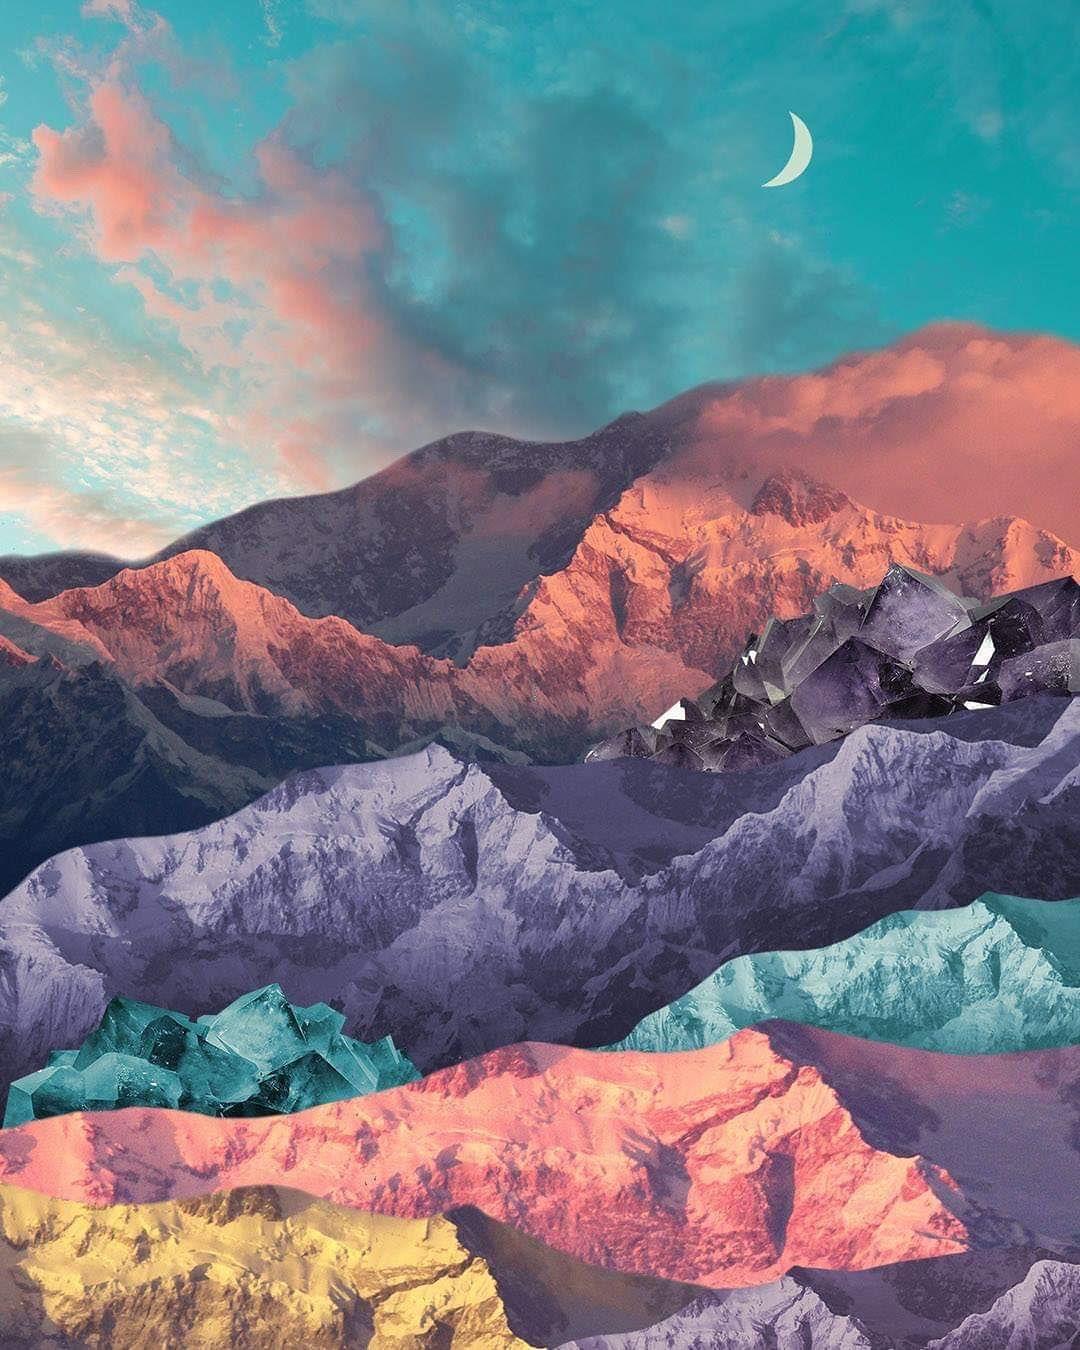 Moon Mountains Collage Collageart Collageartist Art Arte Vintage Landscape Mountains Karenlynch Collage Landscape Mountain Art Print Nature Collage